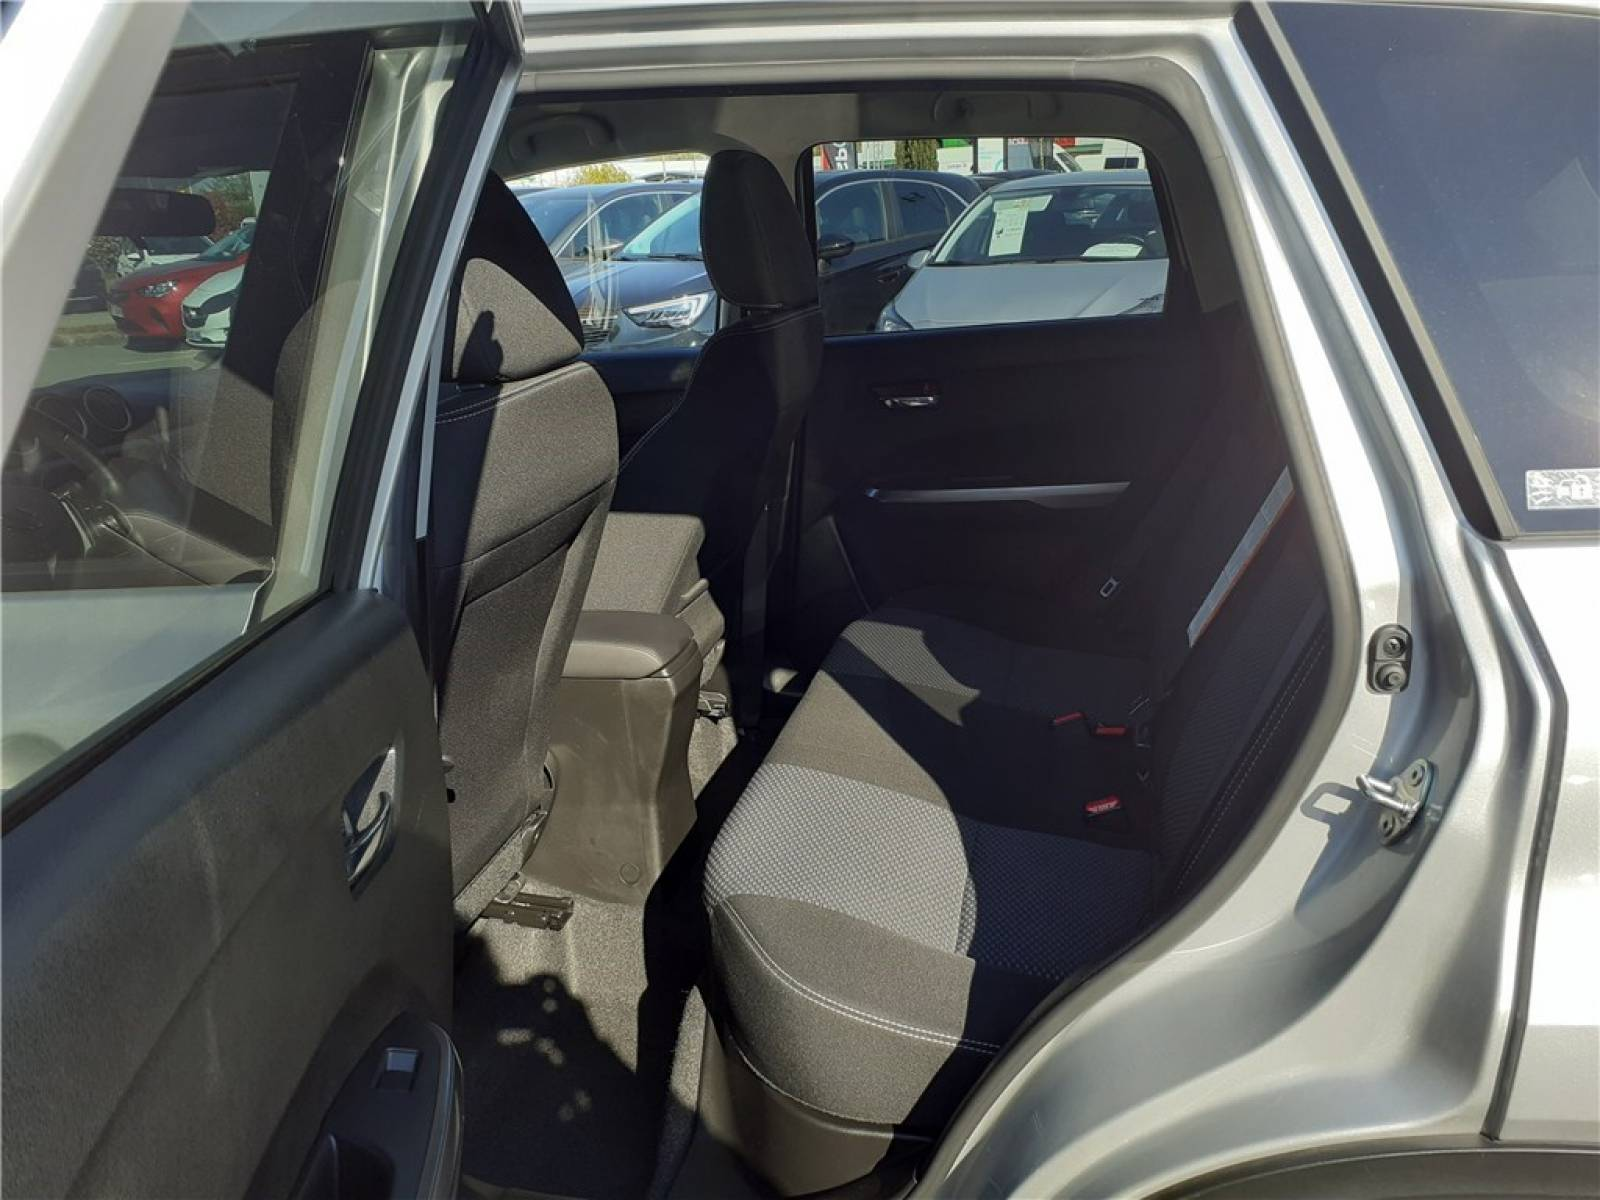 SUZUKI Vitara 1.0 Boosterjet - véhicule d'occasion - Groupe Guillet - Opel Magicauto - Chalon-sur-Saône - 71380 - Saint-Marcel - 16